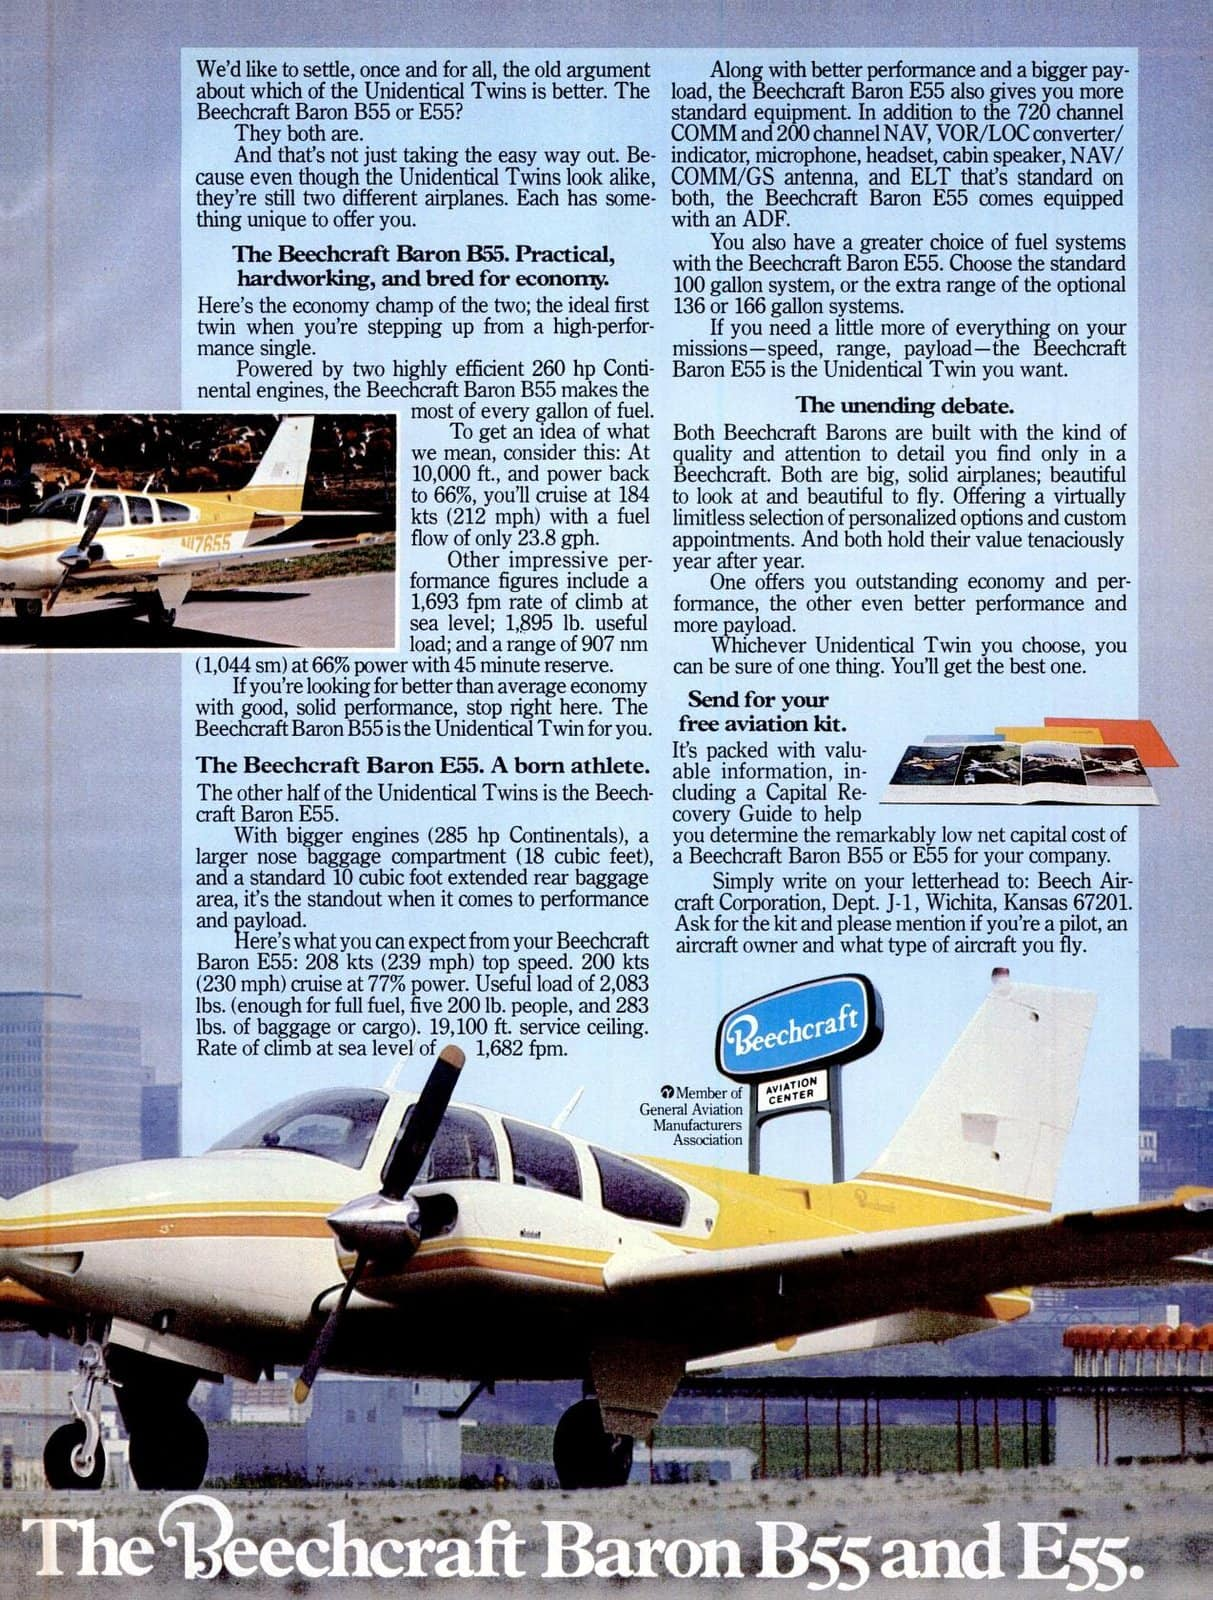 Vintage Beechcraft Baron B55 and E55 propeller planes (2)